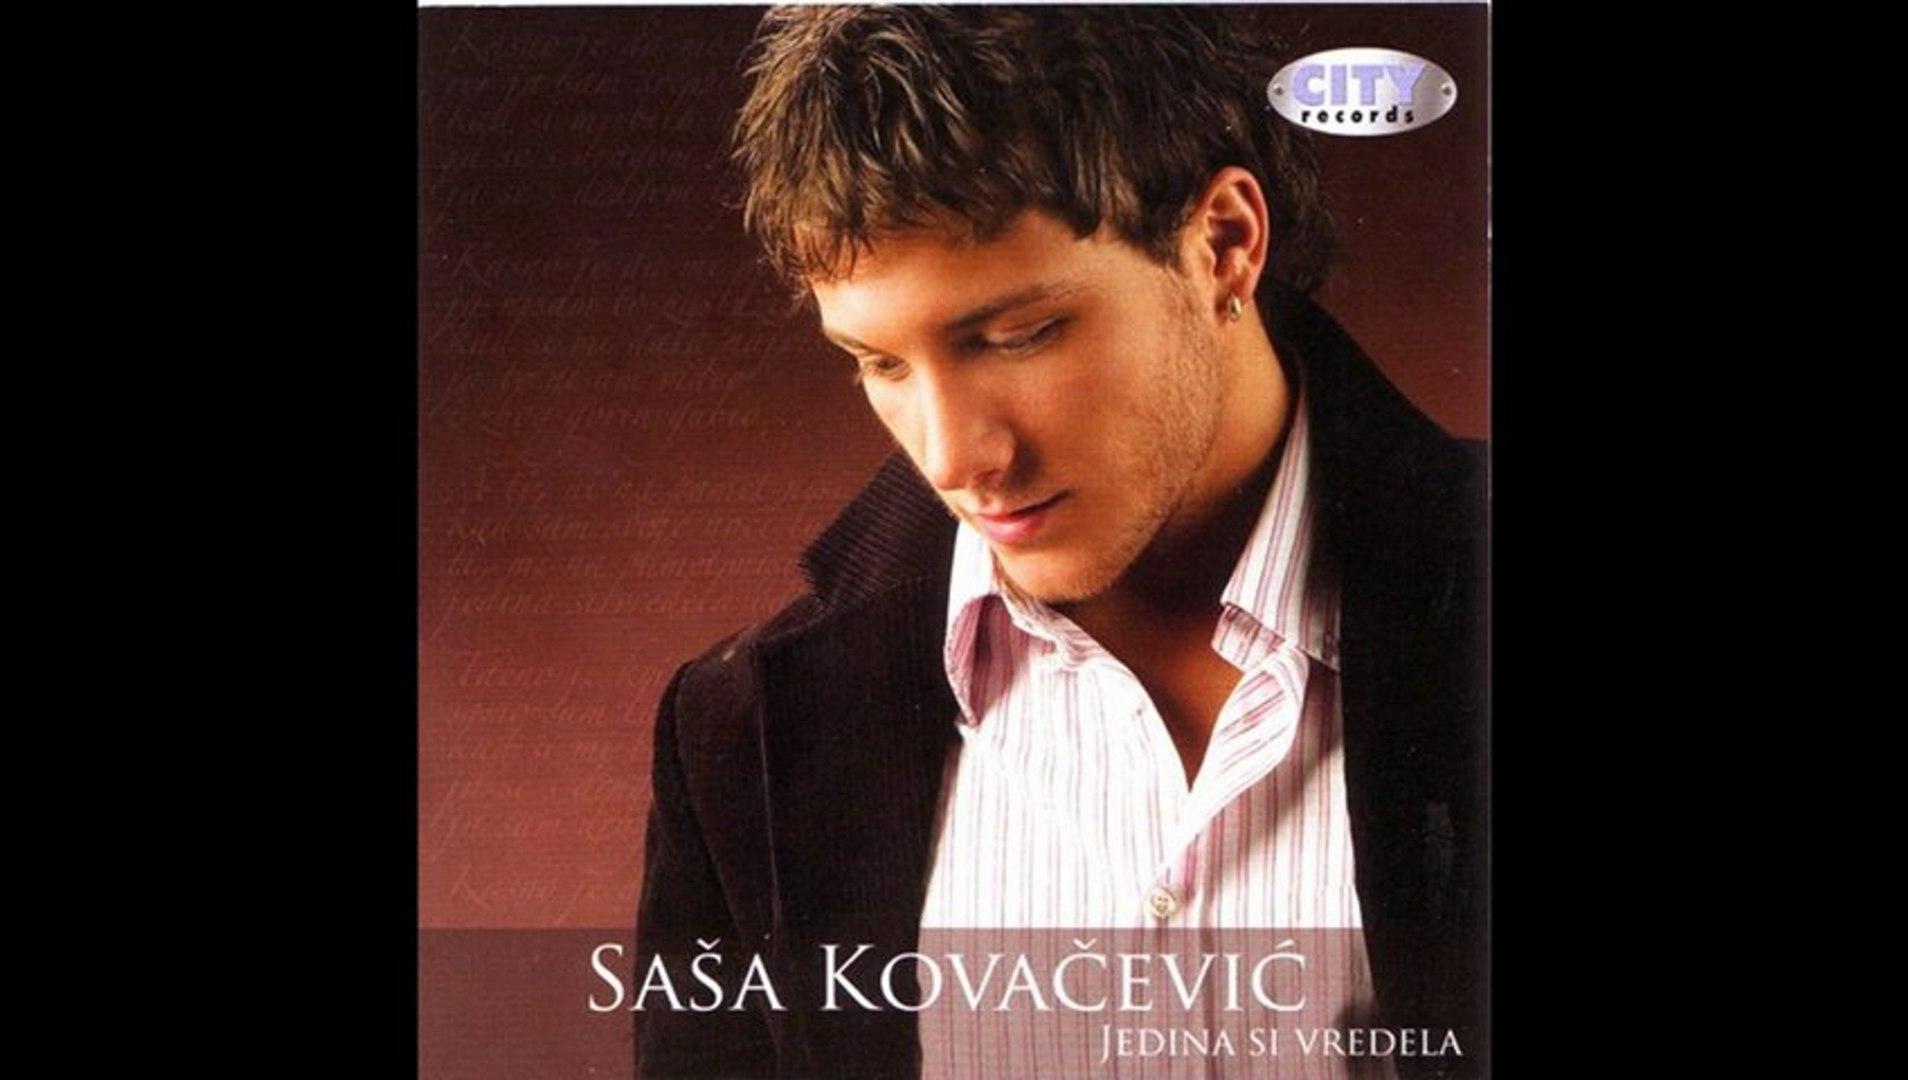 Sasa Kovacevic - Ostavi me - (Audio 2006) HD